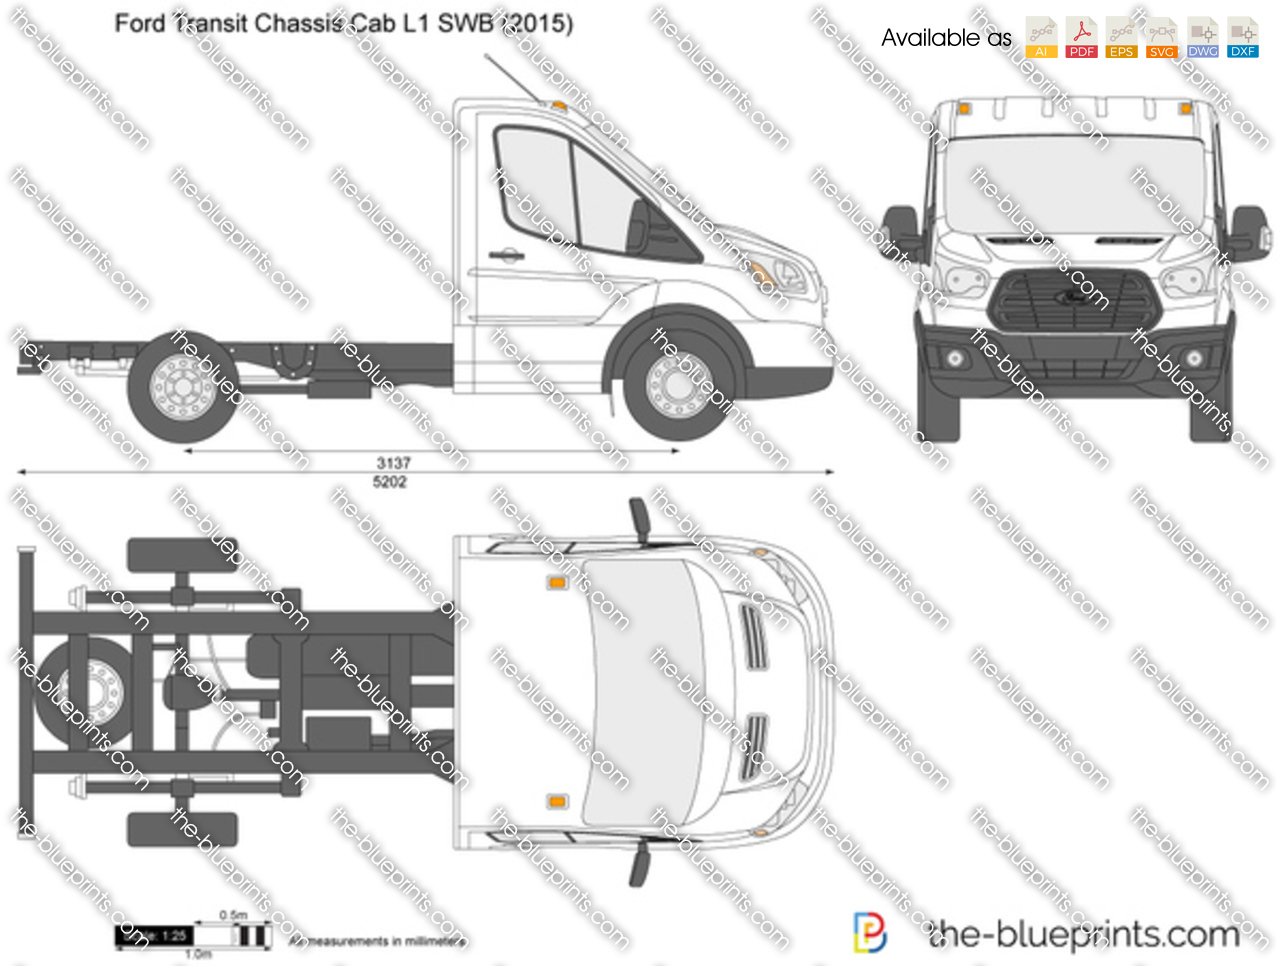 Ford Transit Chassis Cab L1 SWB 2018